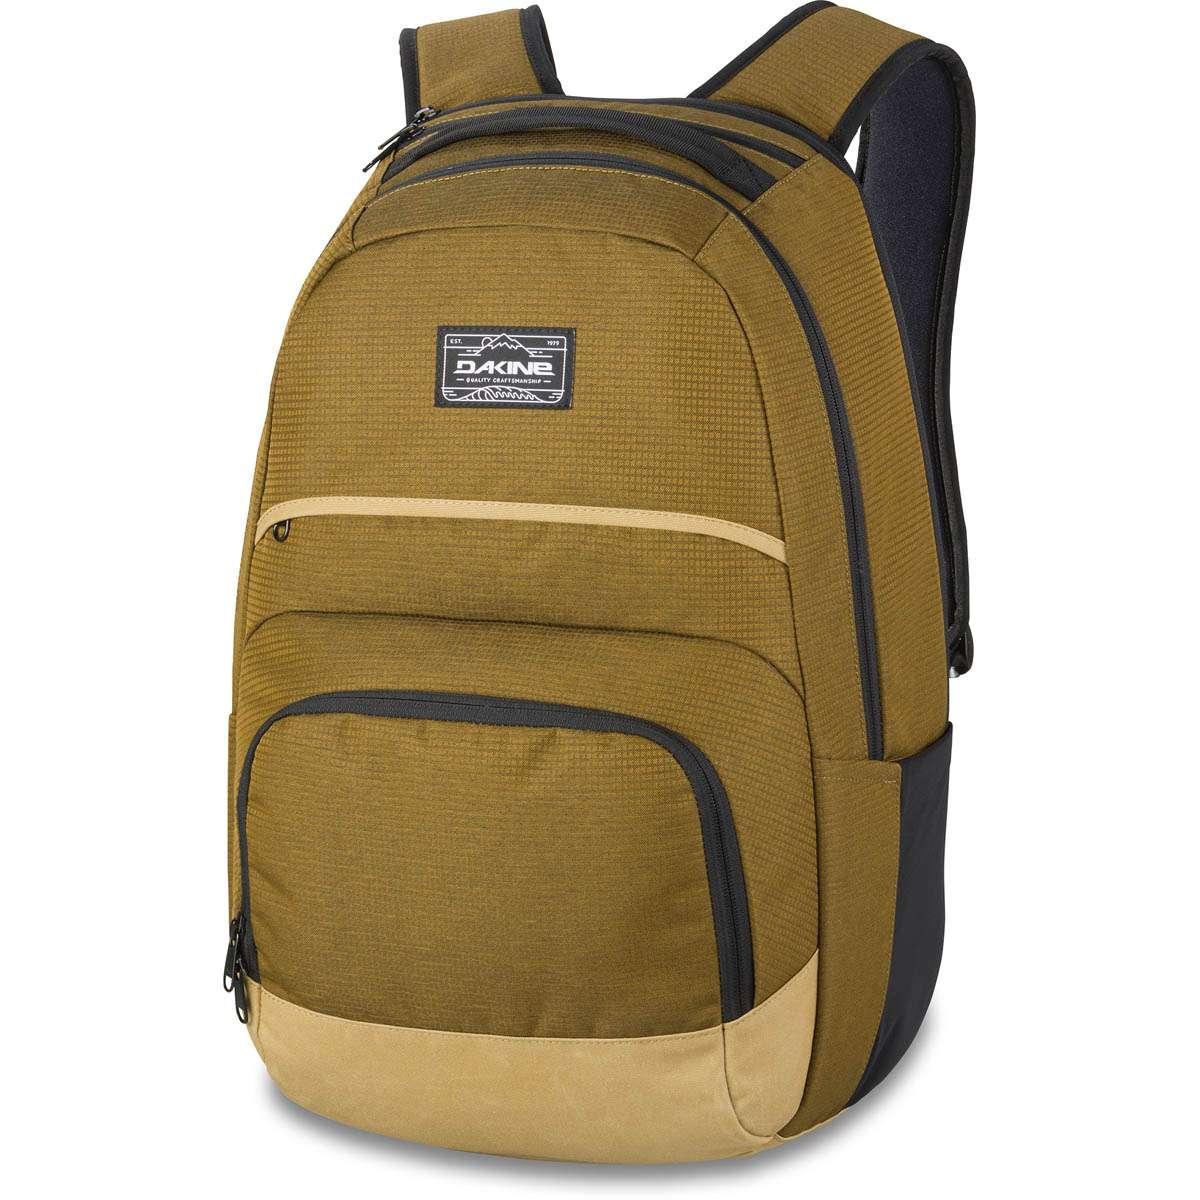 2139458ec55fd Dakine Campus DLX 33L Backpack Tamarindo